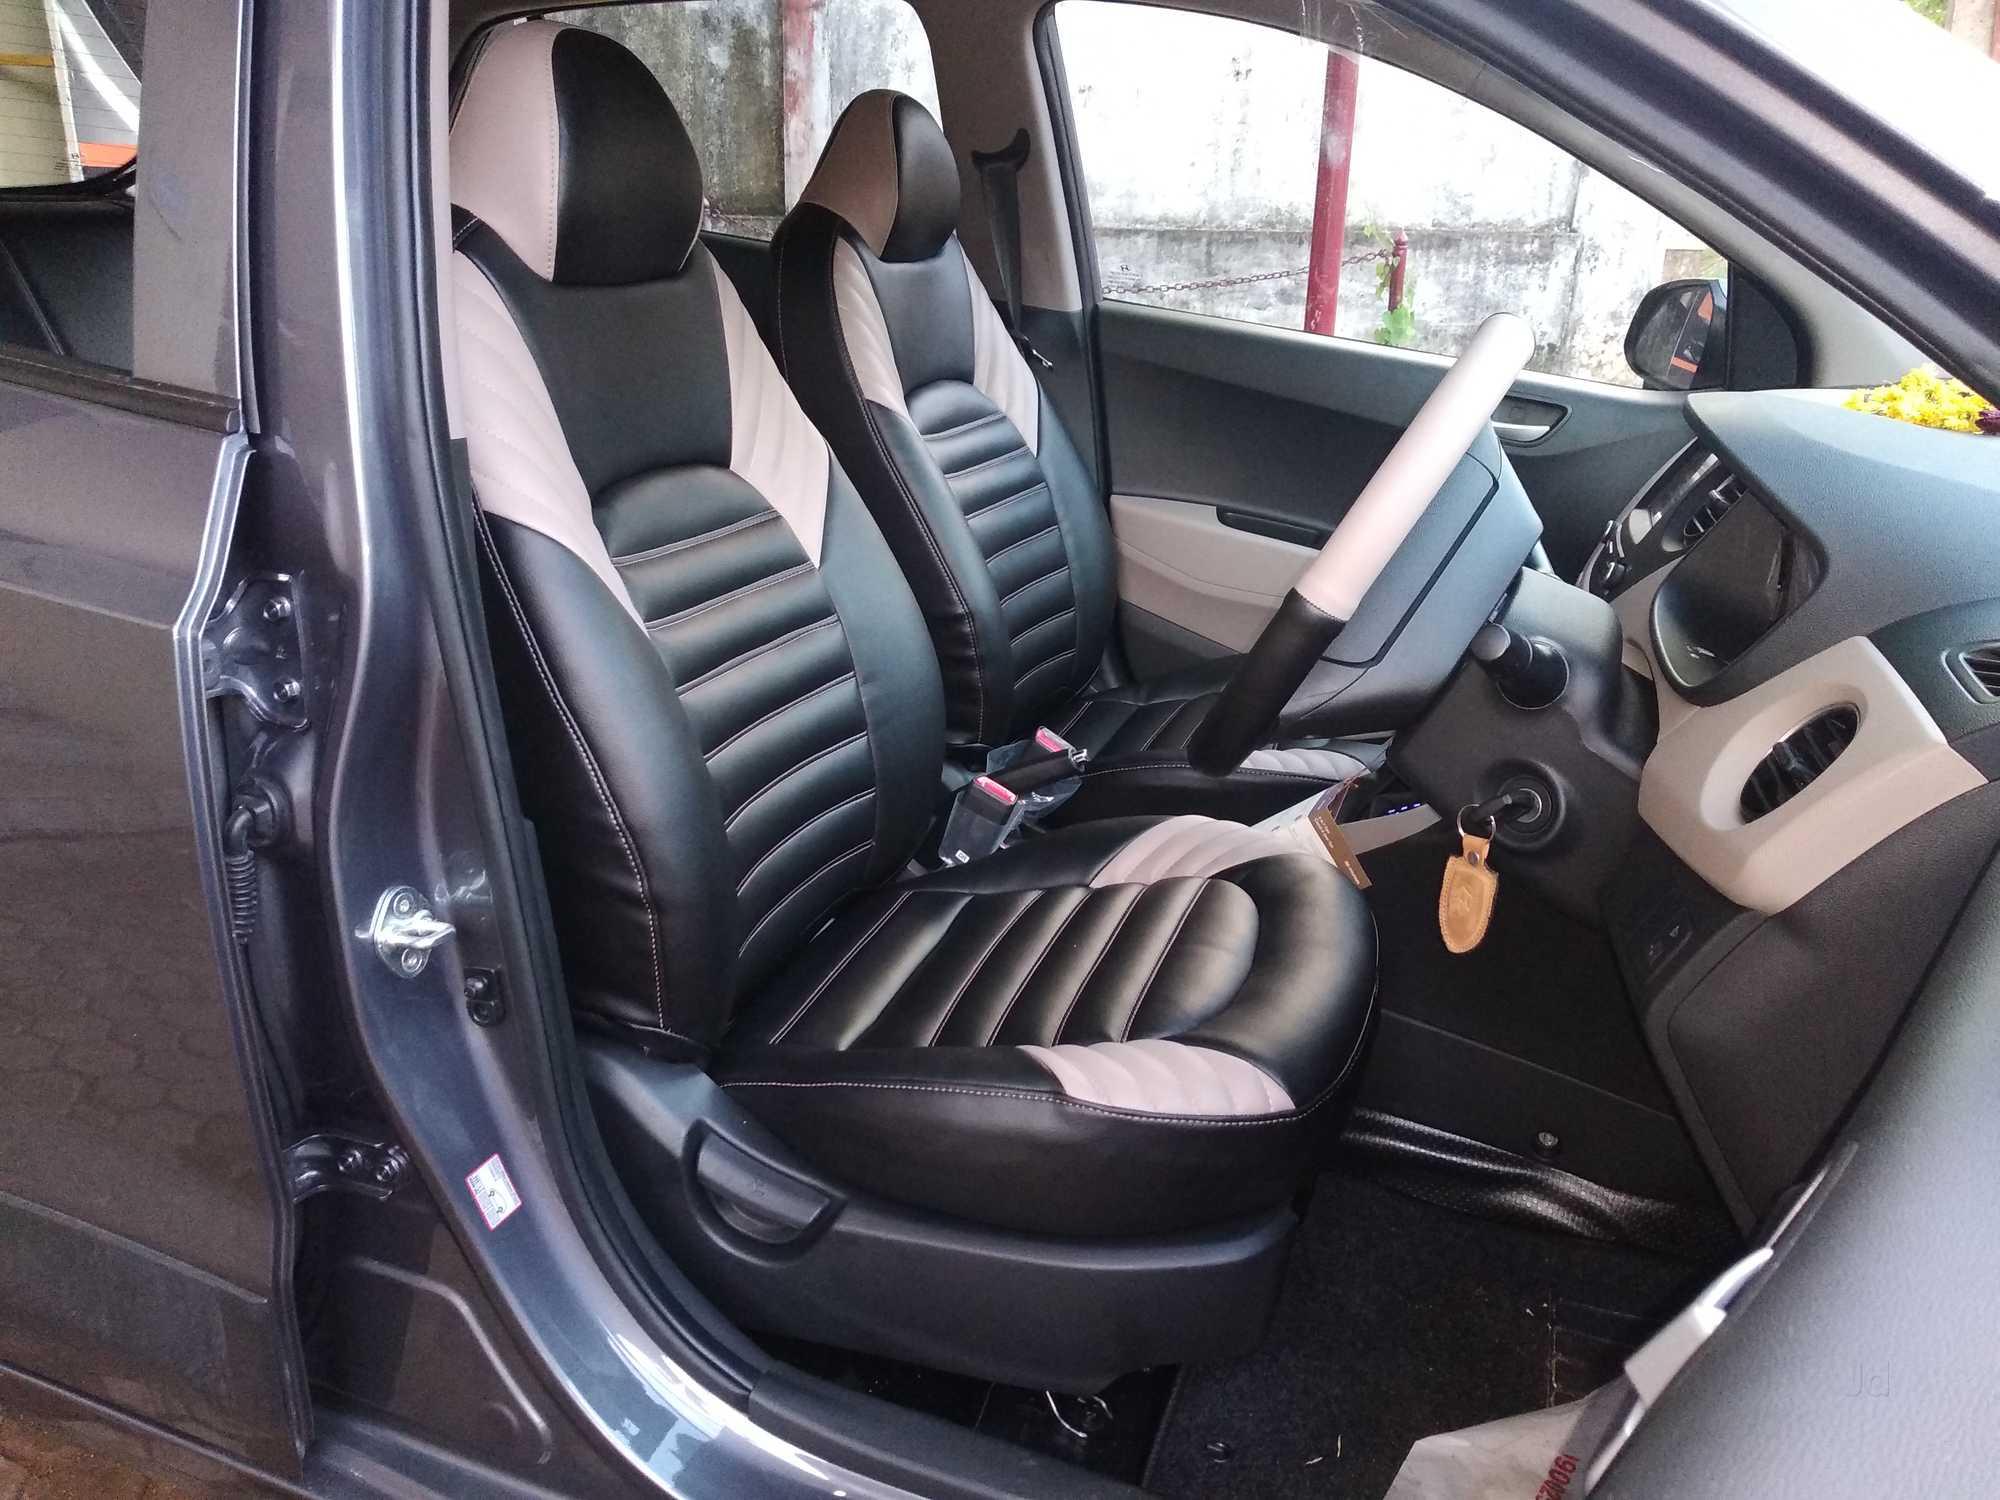 Top Car Customization Services in Mangalore - Best Car